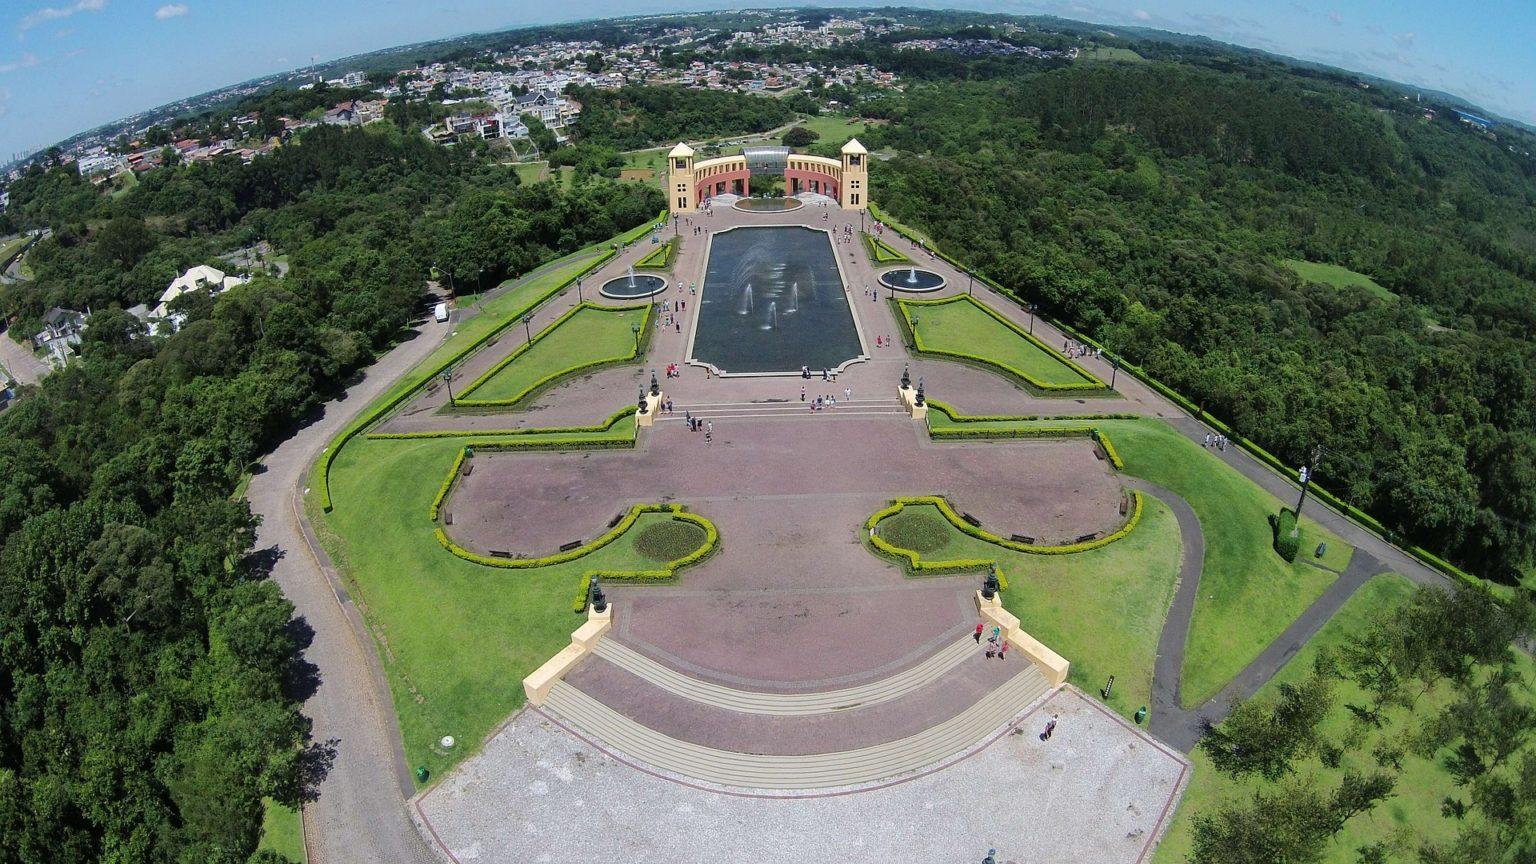 Walking tour in Curitiba